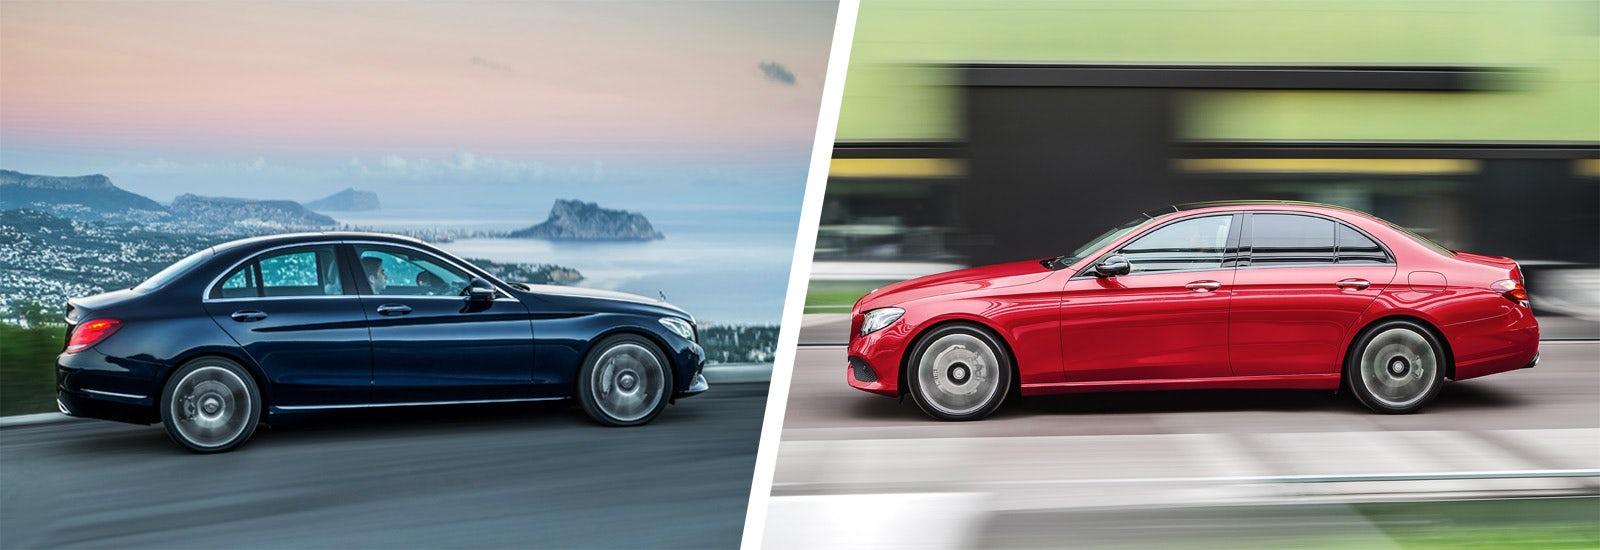 Mercedes C-Class vs Mercedes E-Class comparison | carwow